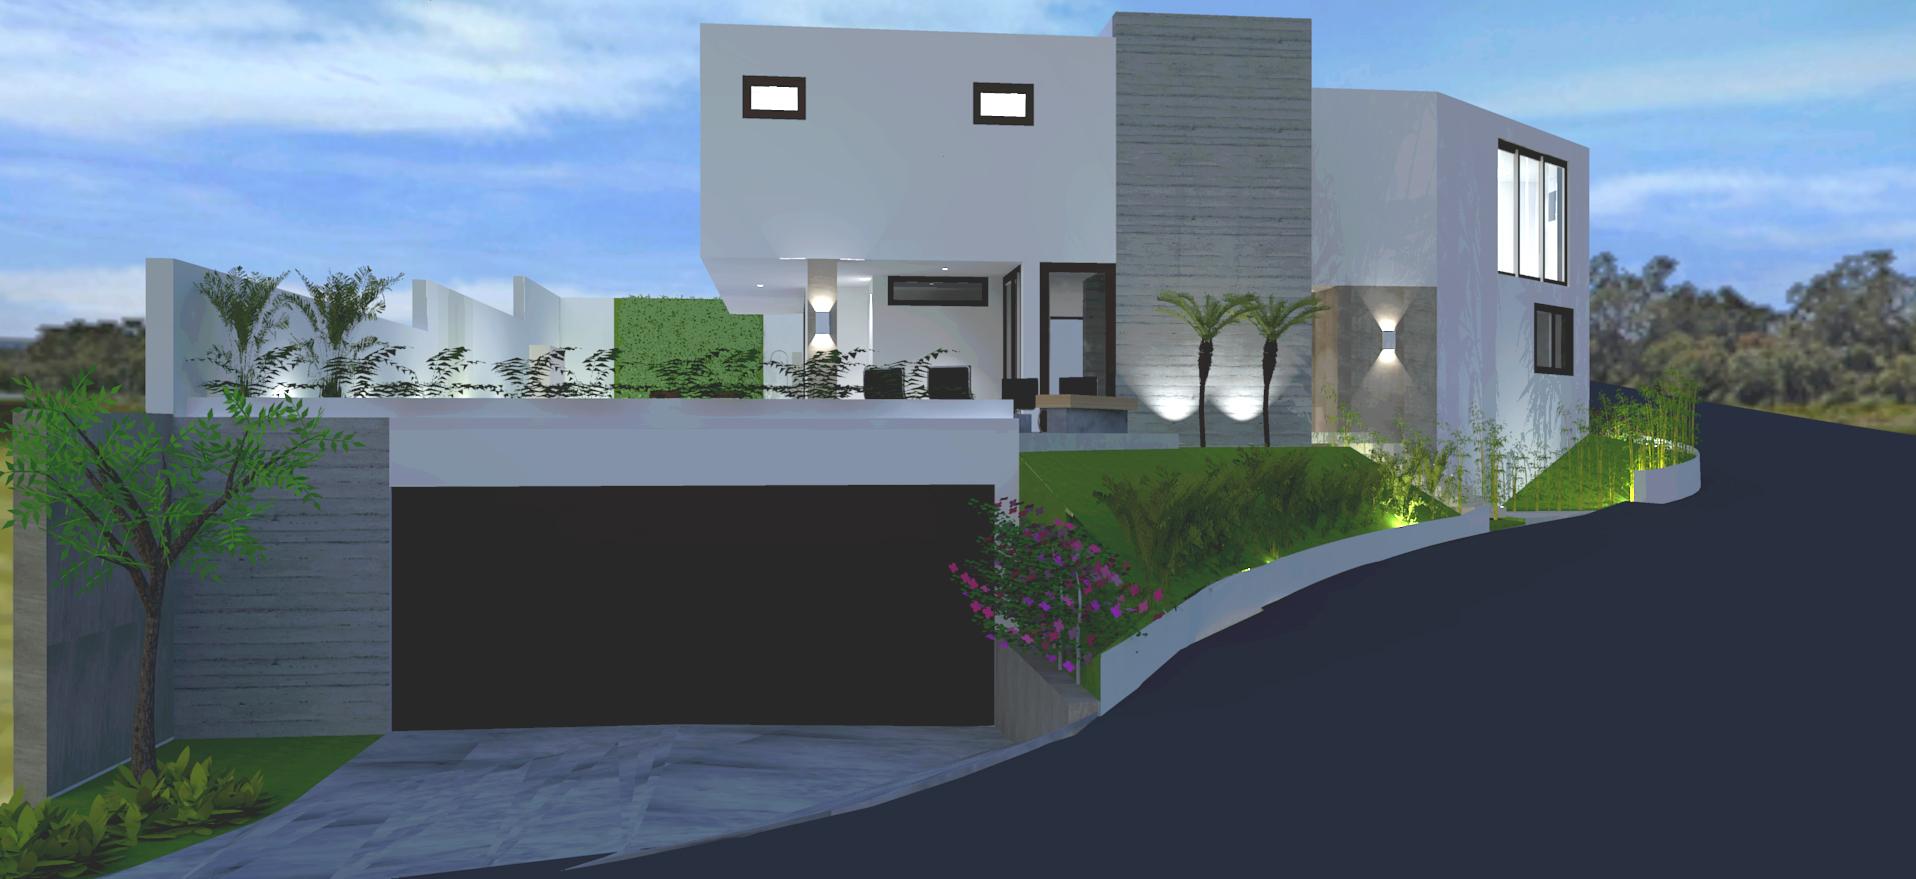 midrie-arquitetura-Residencia1_v1_ed1.jpg